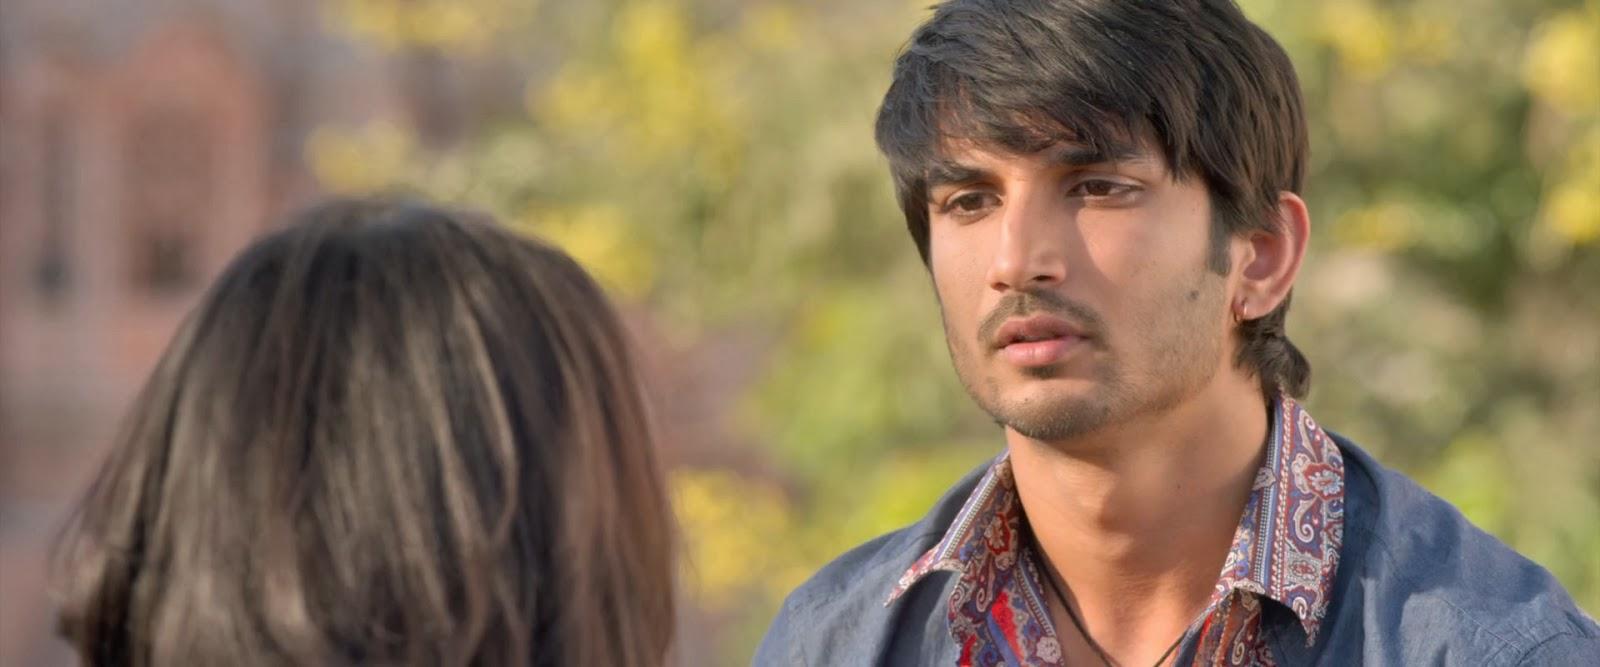 Shuddh Desi Romance (2013) S3 s Shuddh Desi Romance (2013)